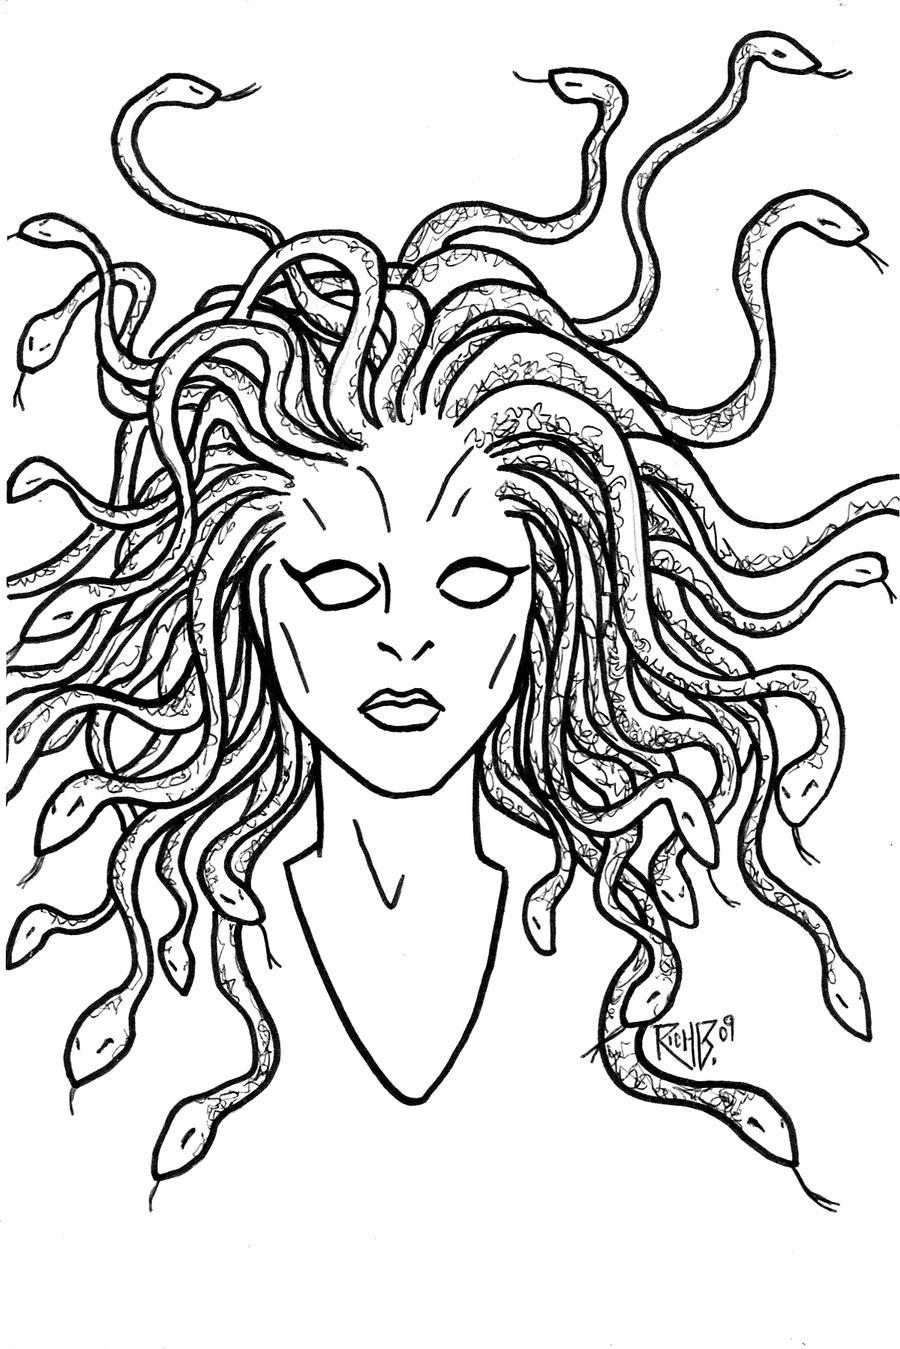 medusa coloring page medusa mythology by richbernatovech on deviantart